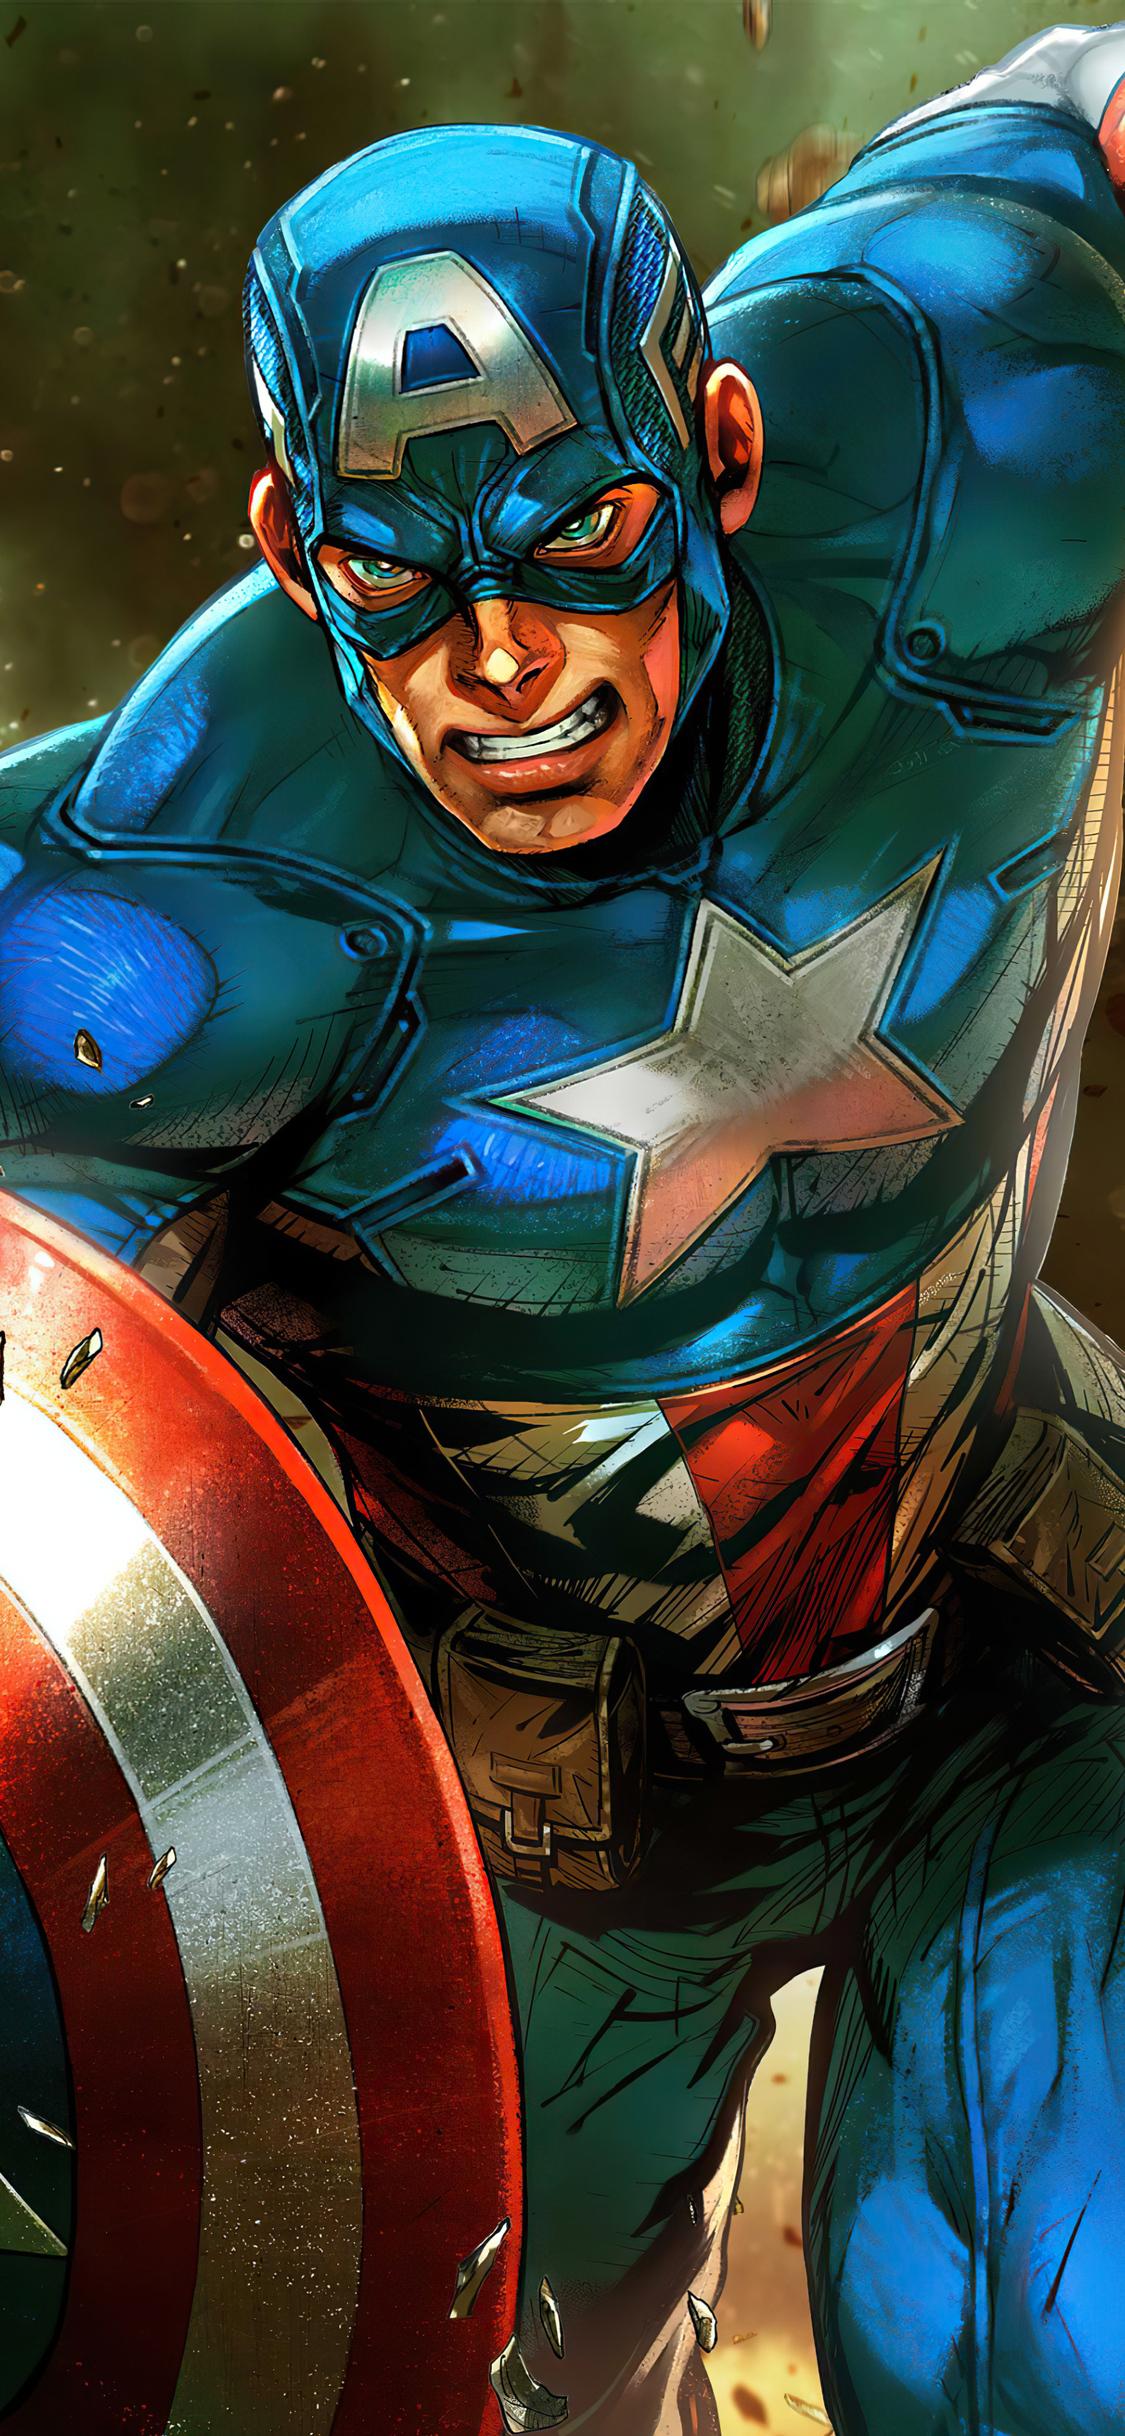 1125x2436 Captain America 2020 4k Artwork Iphone XS,Iphone ...